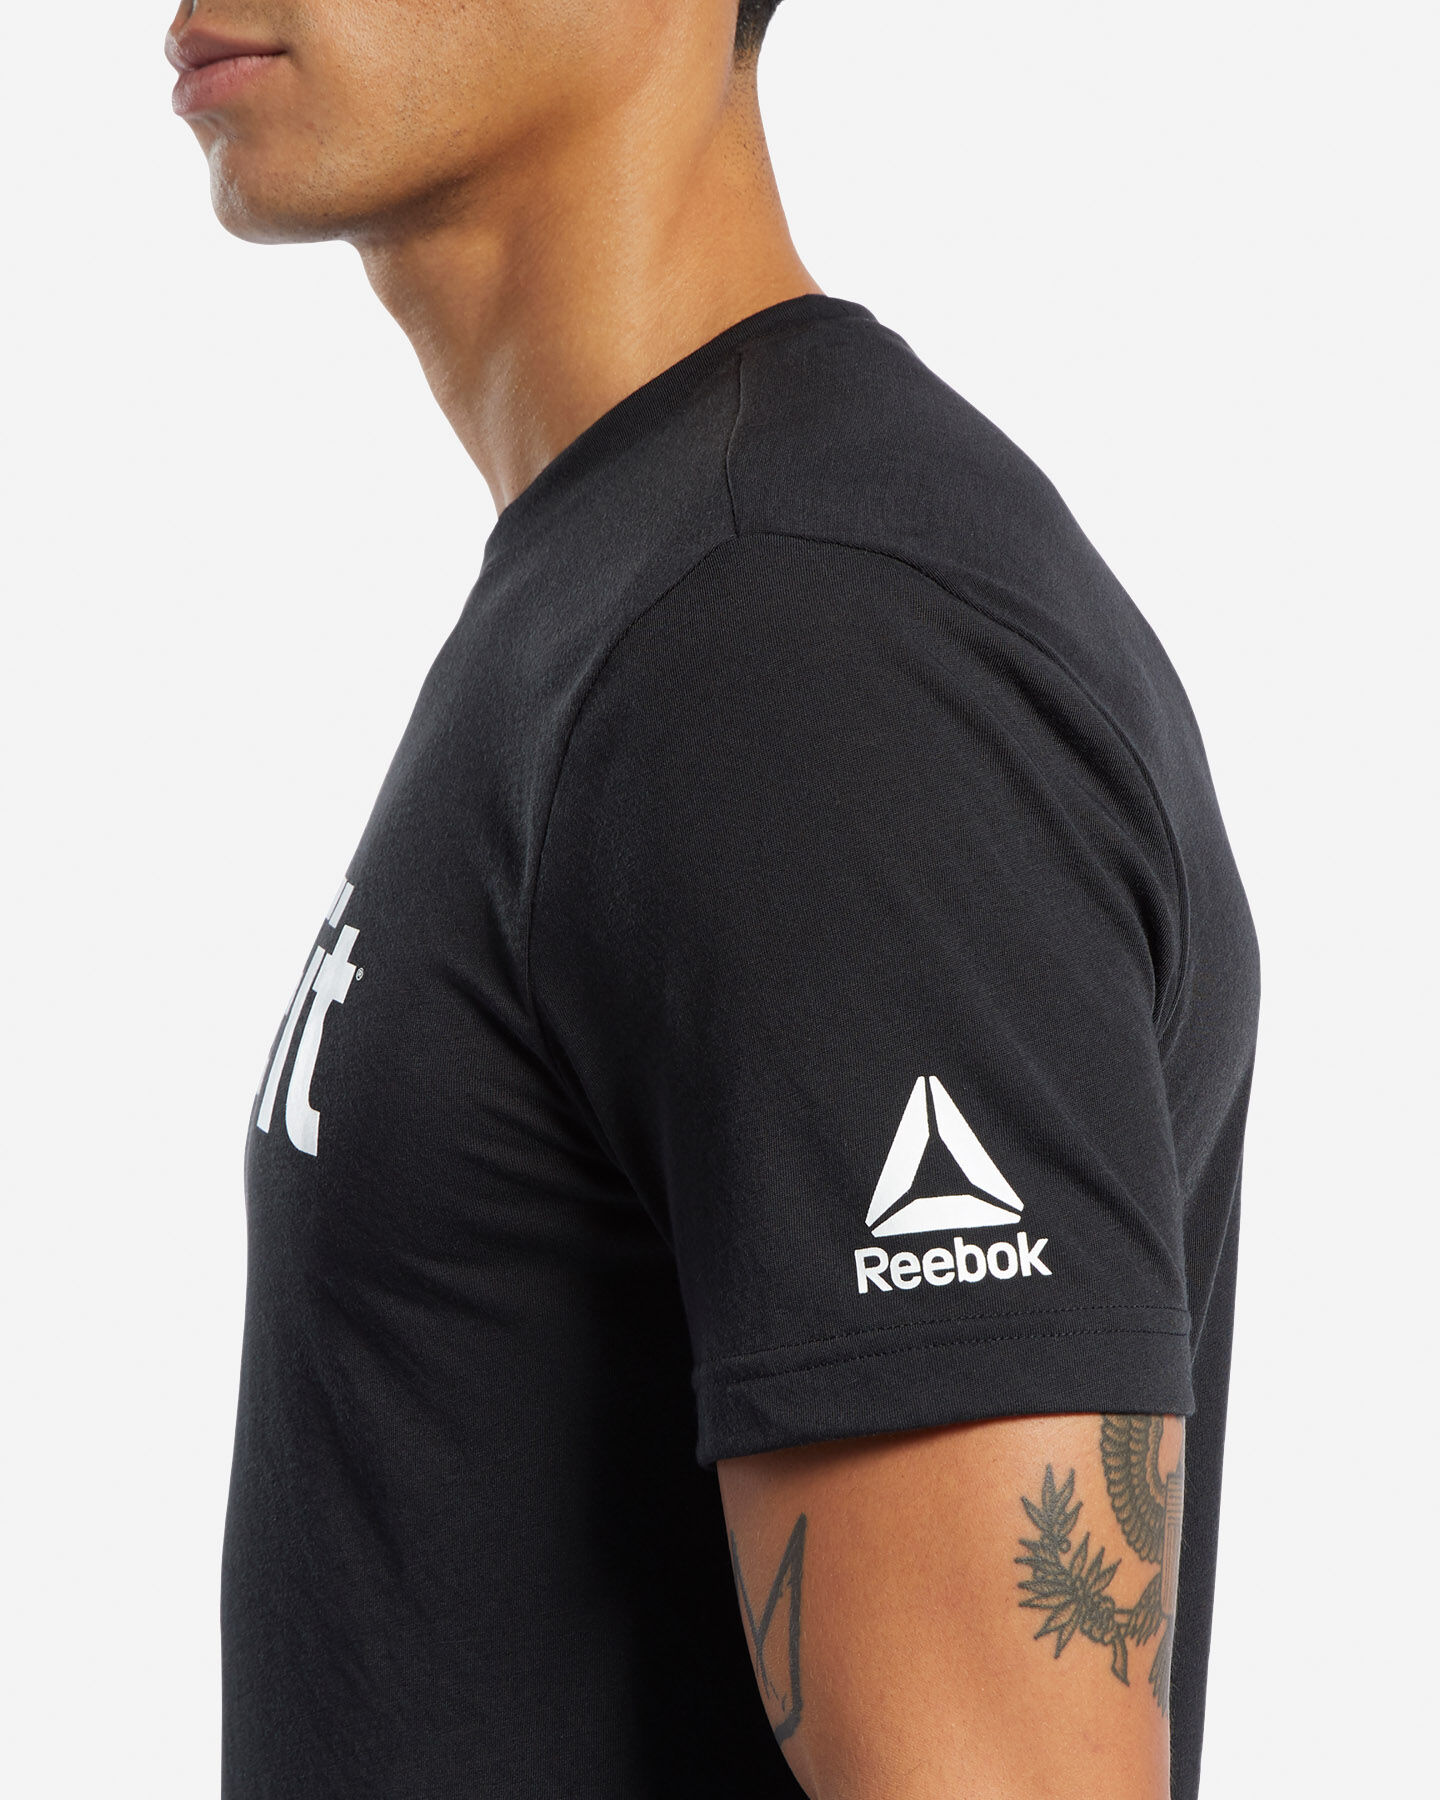 T-Shirt training REEBOK READ M S5145324 scatto 5